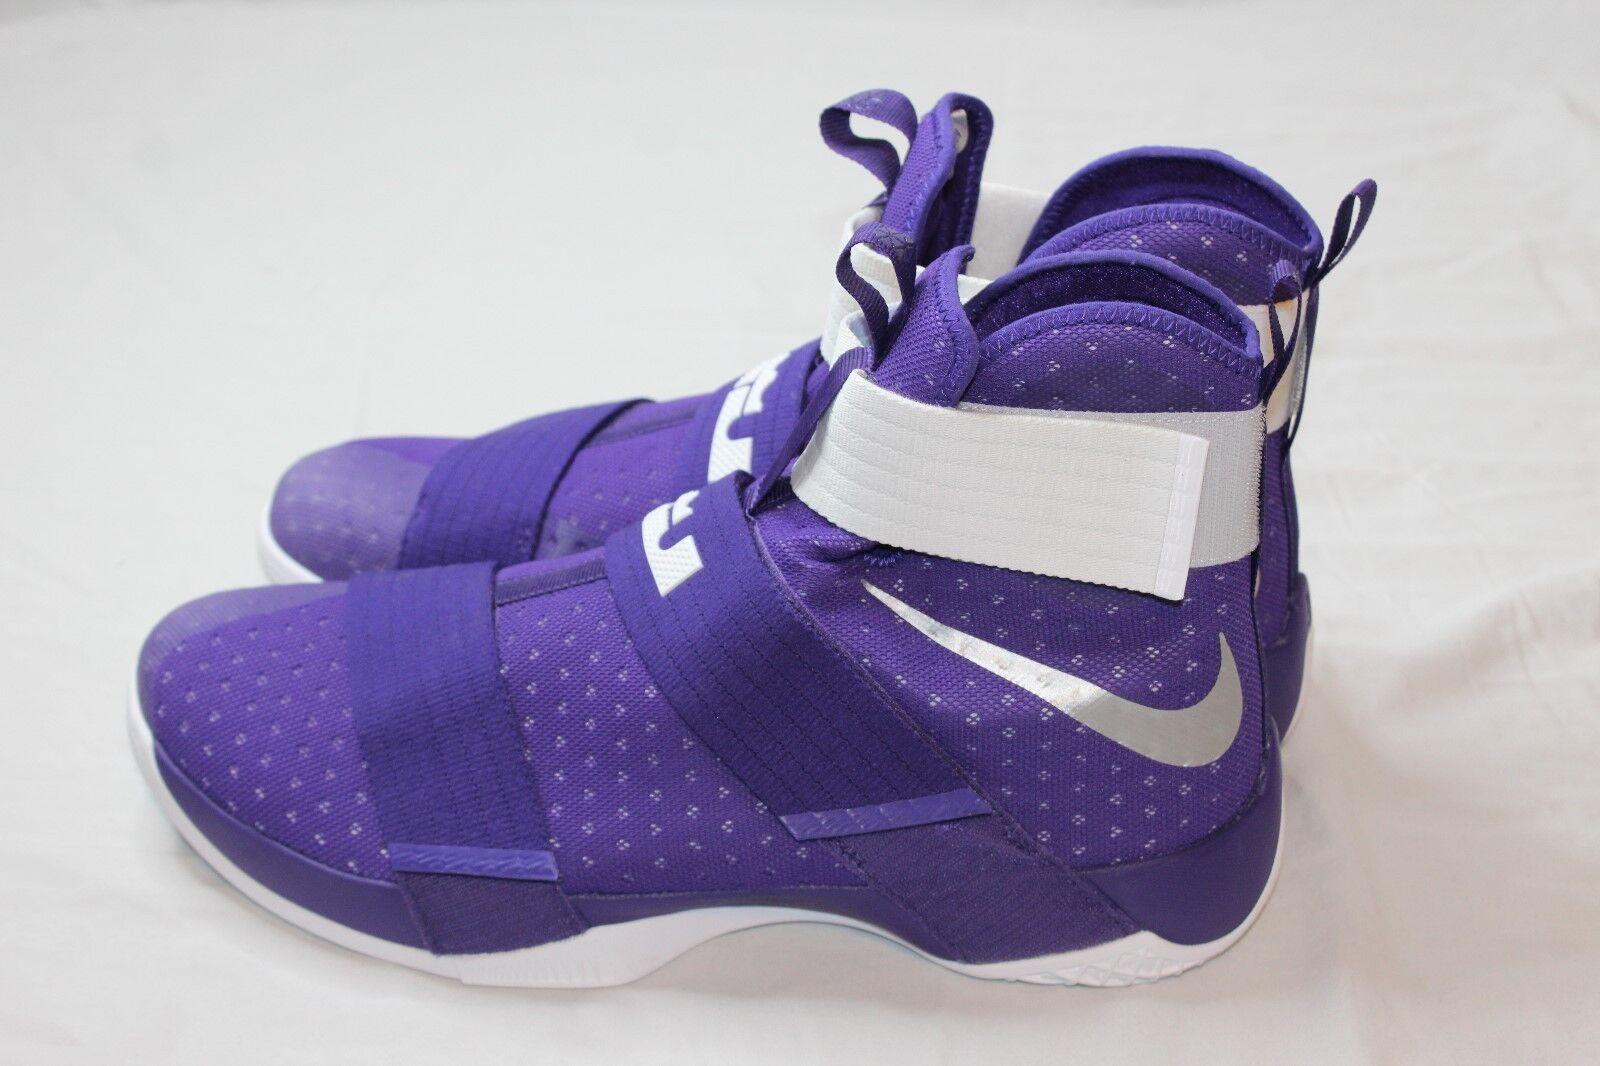 Nike LeBron LeBron LeBron Soldier 10  X 856489-551 White Purple Size 17 Retail  130 New d45405